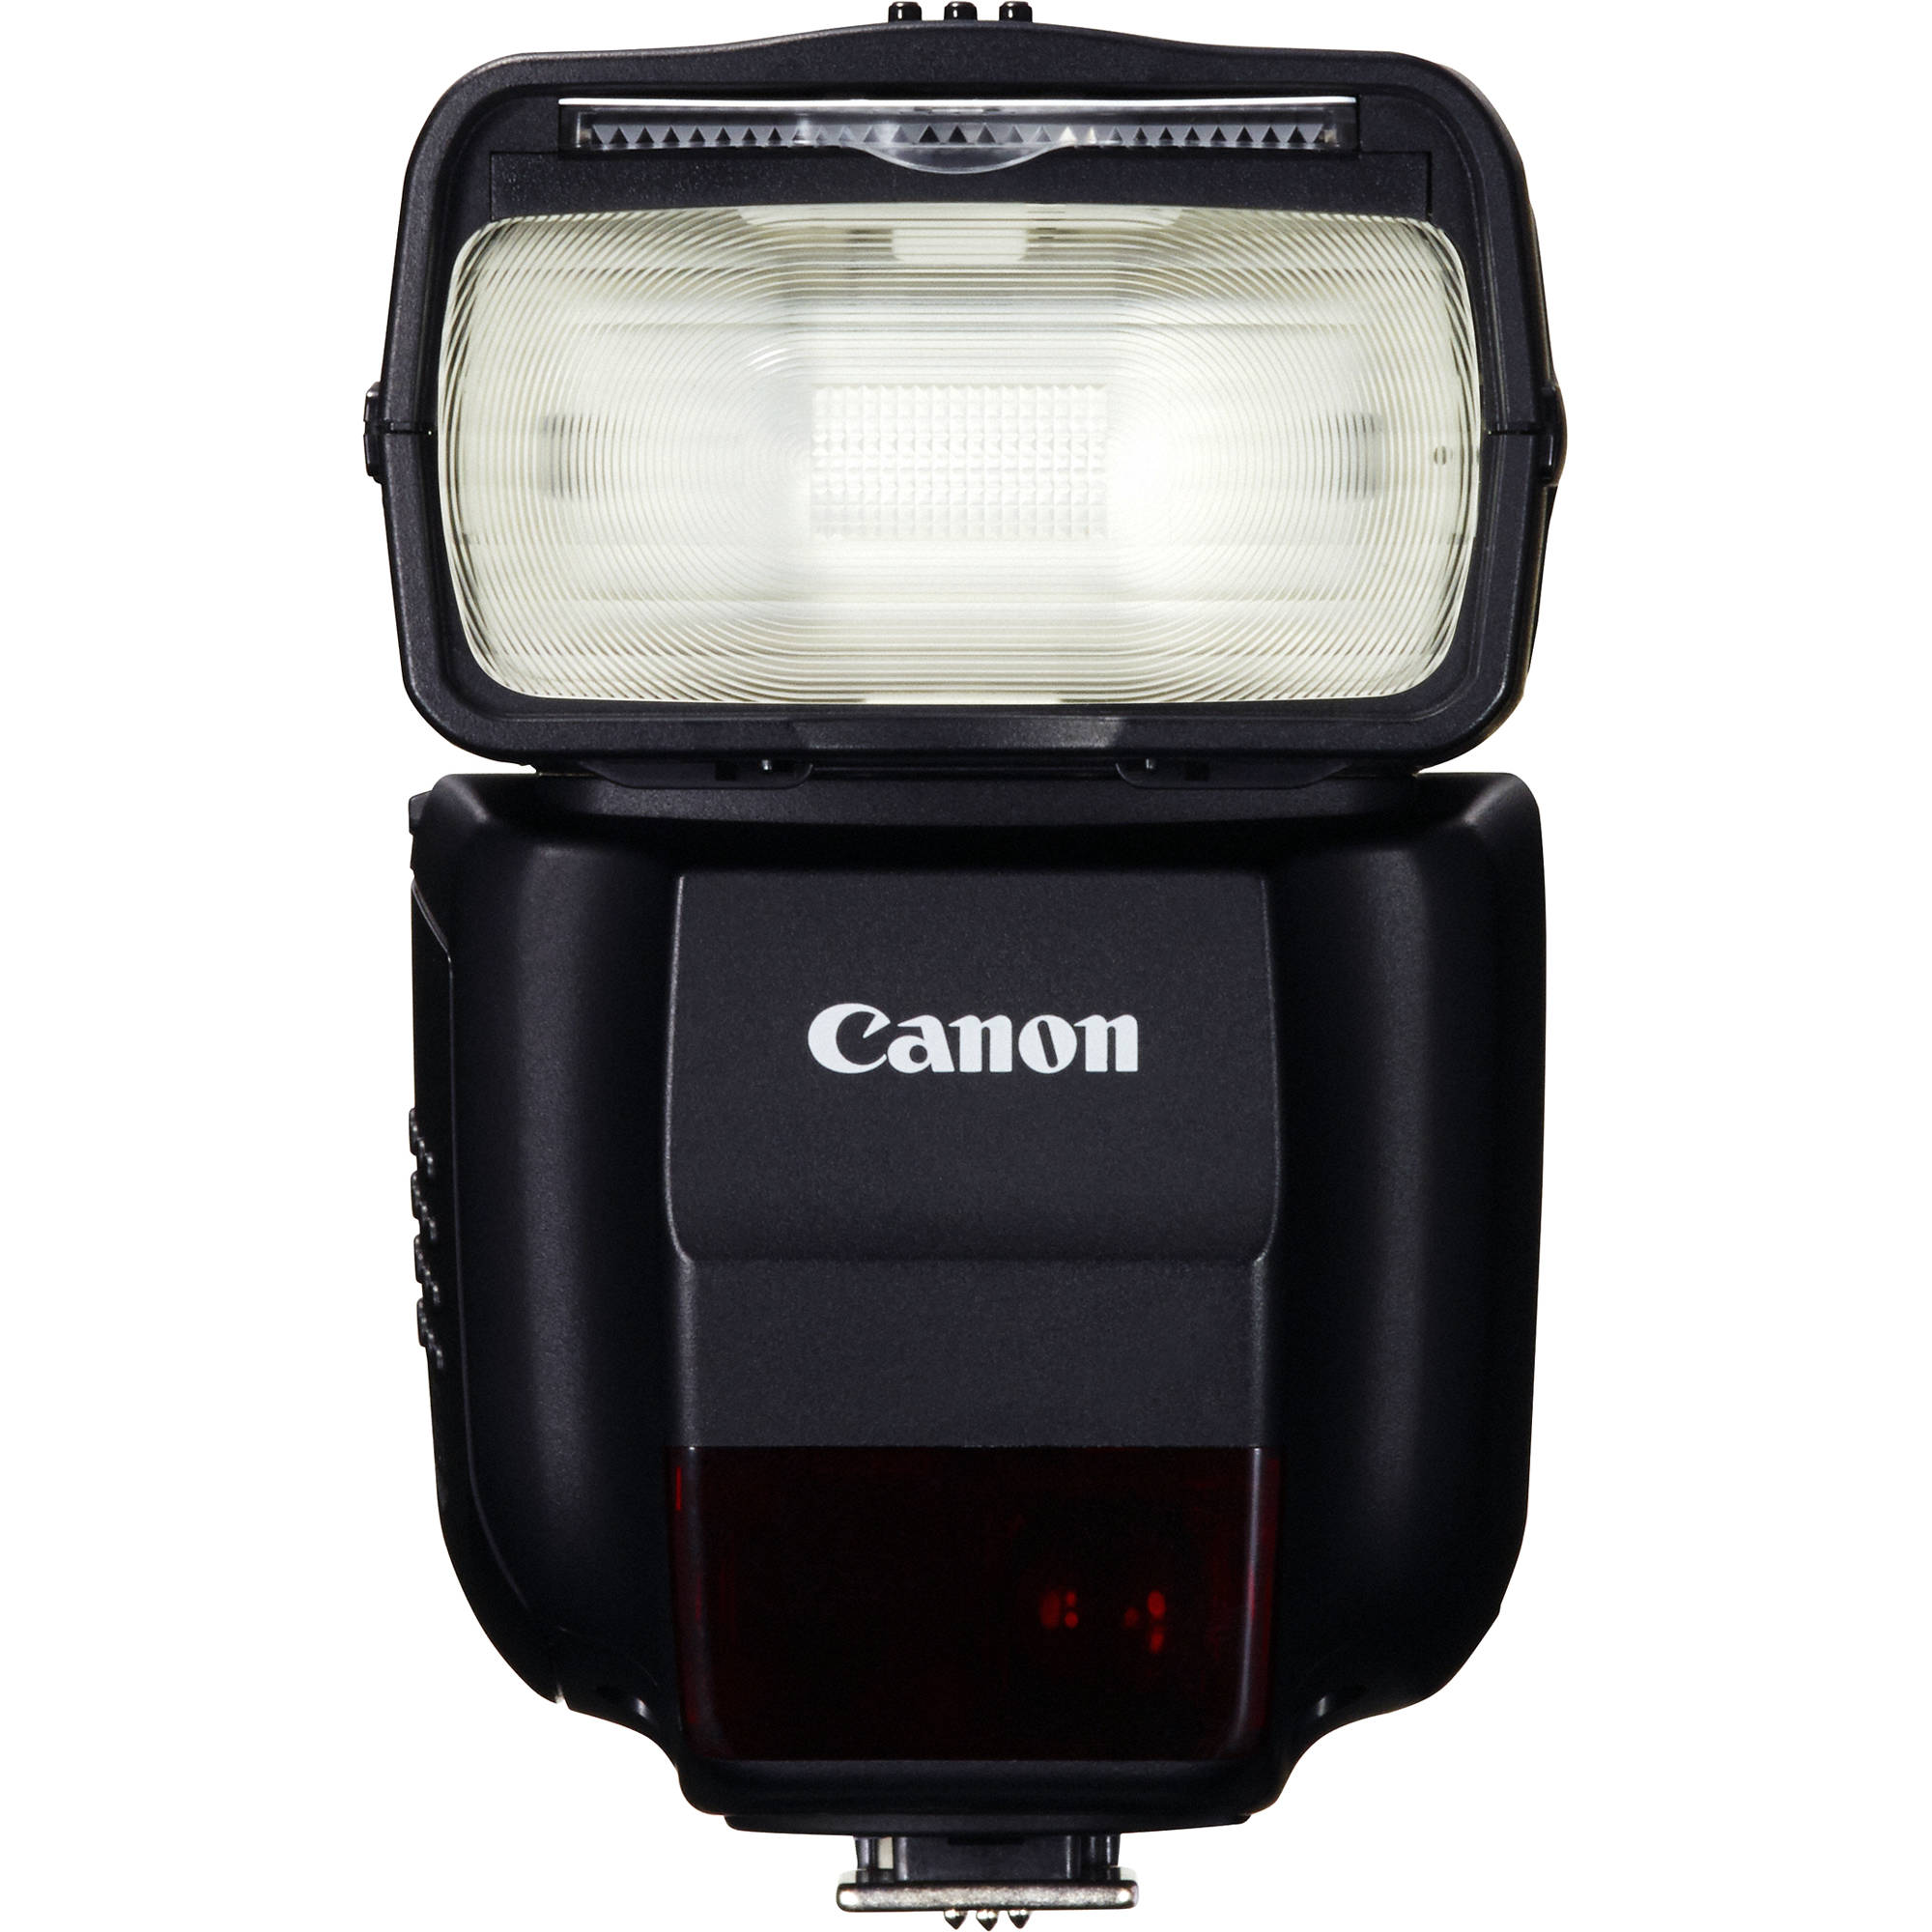 Canon Speedlite 430EX III-RT 0585C006 (430EX III-RT) B&H Photo